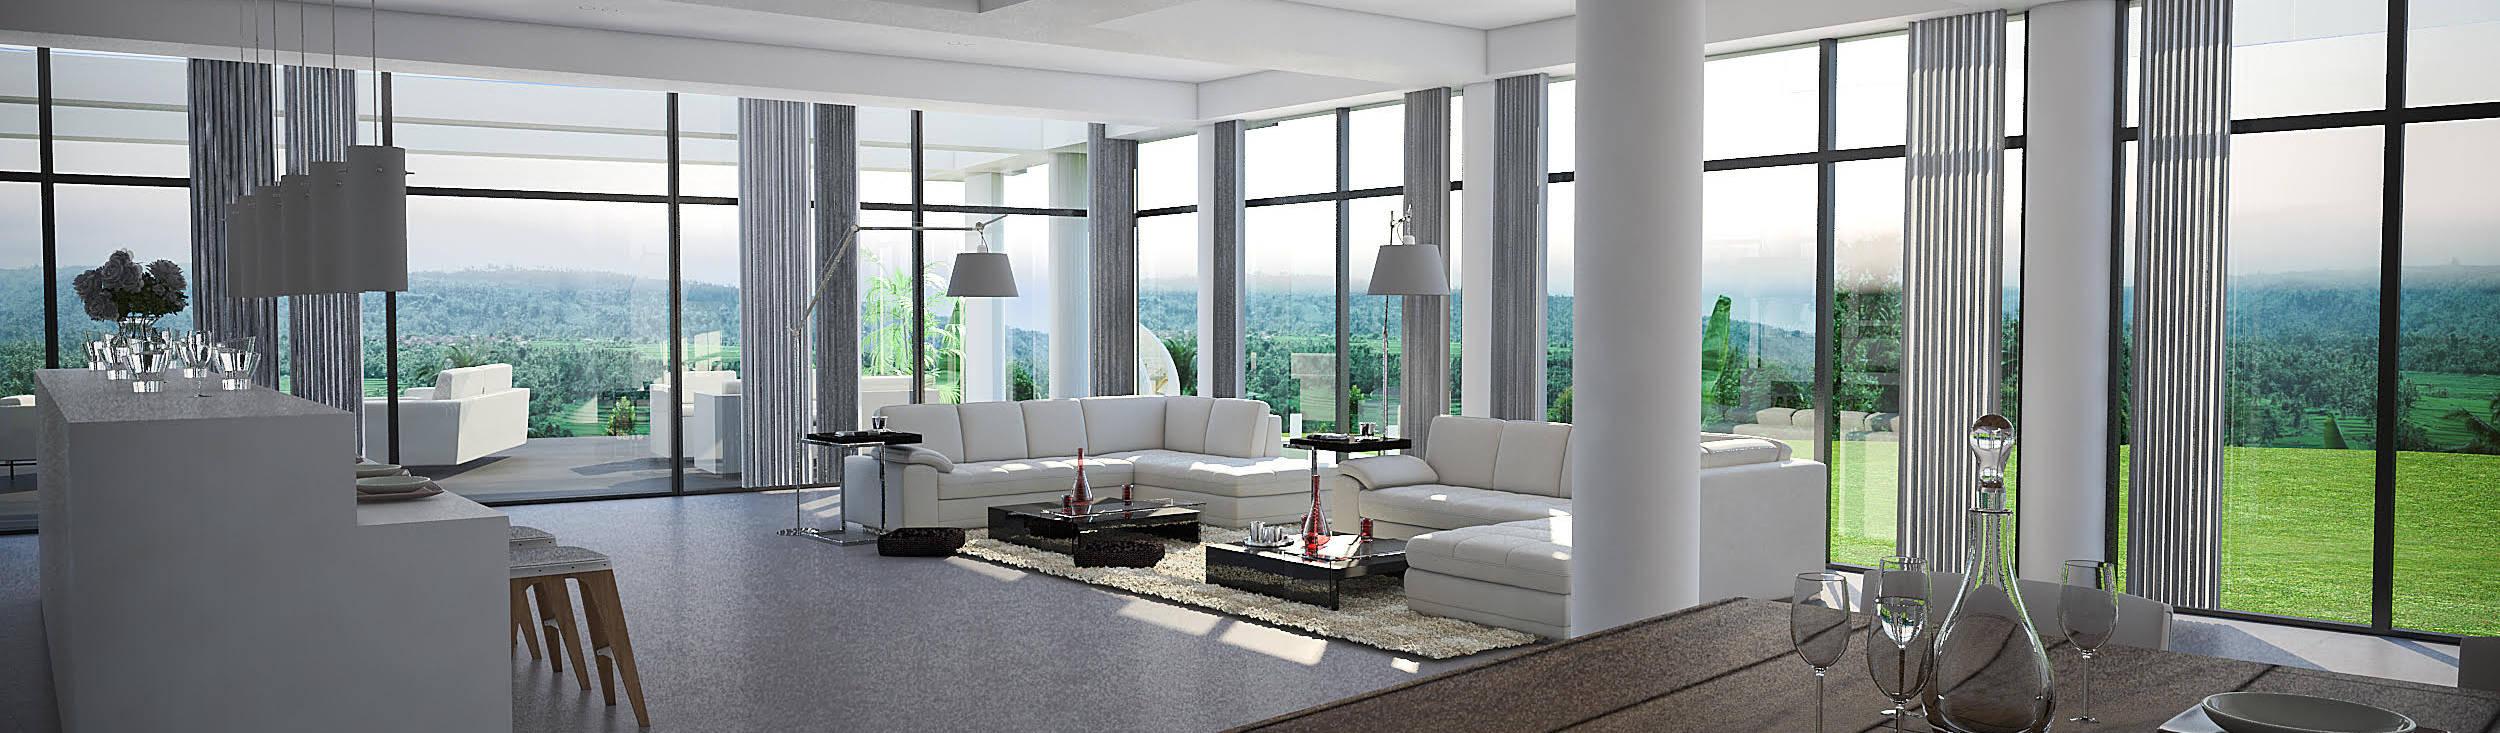 Vivian Dembo Arquitectura